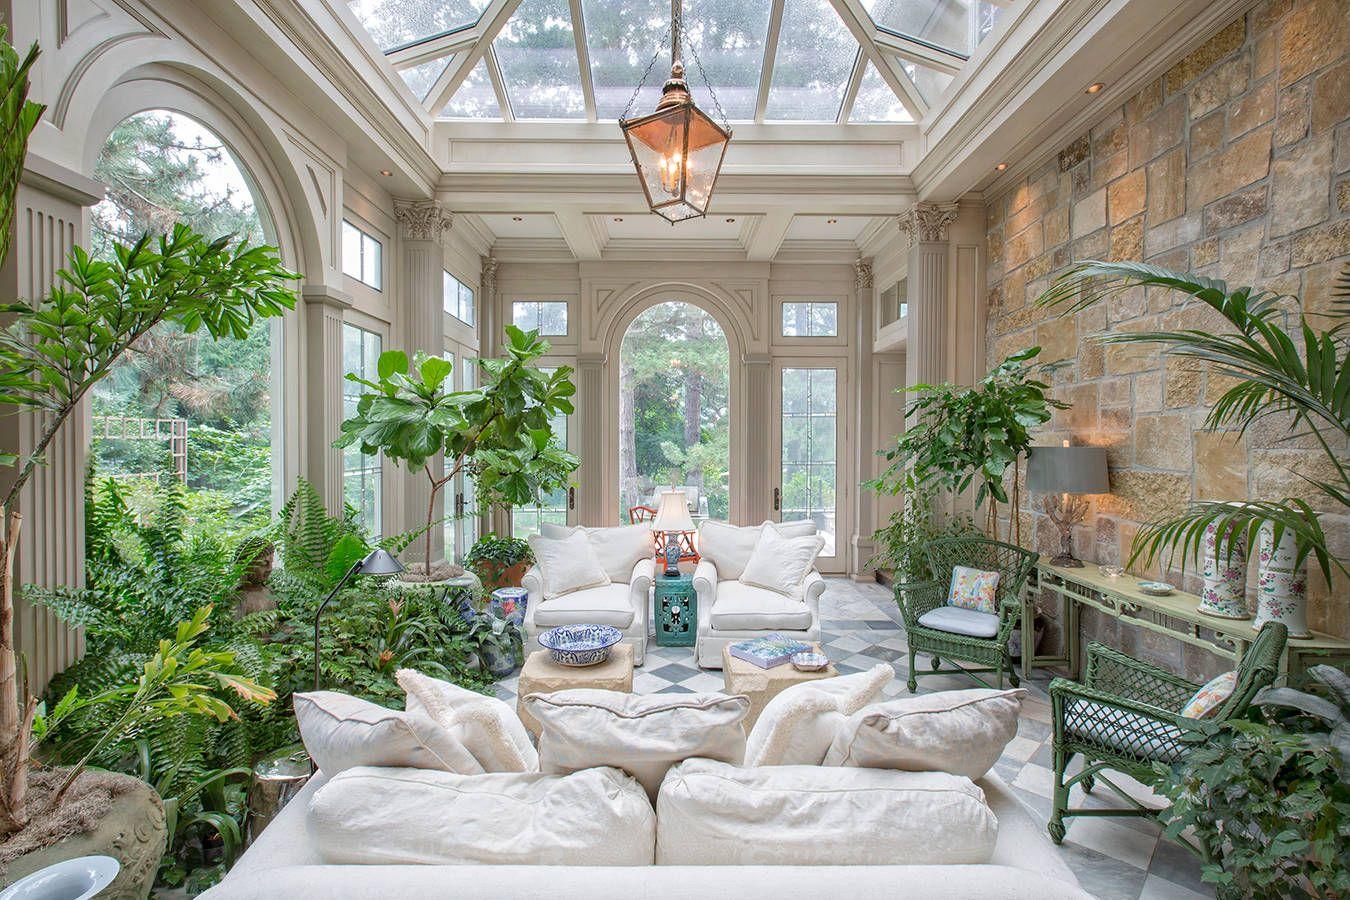 Window ideas for a sunroom  traditional sunroom blends indoor u outdoor greenery omaha ne